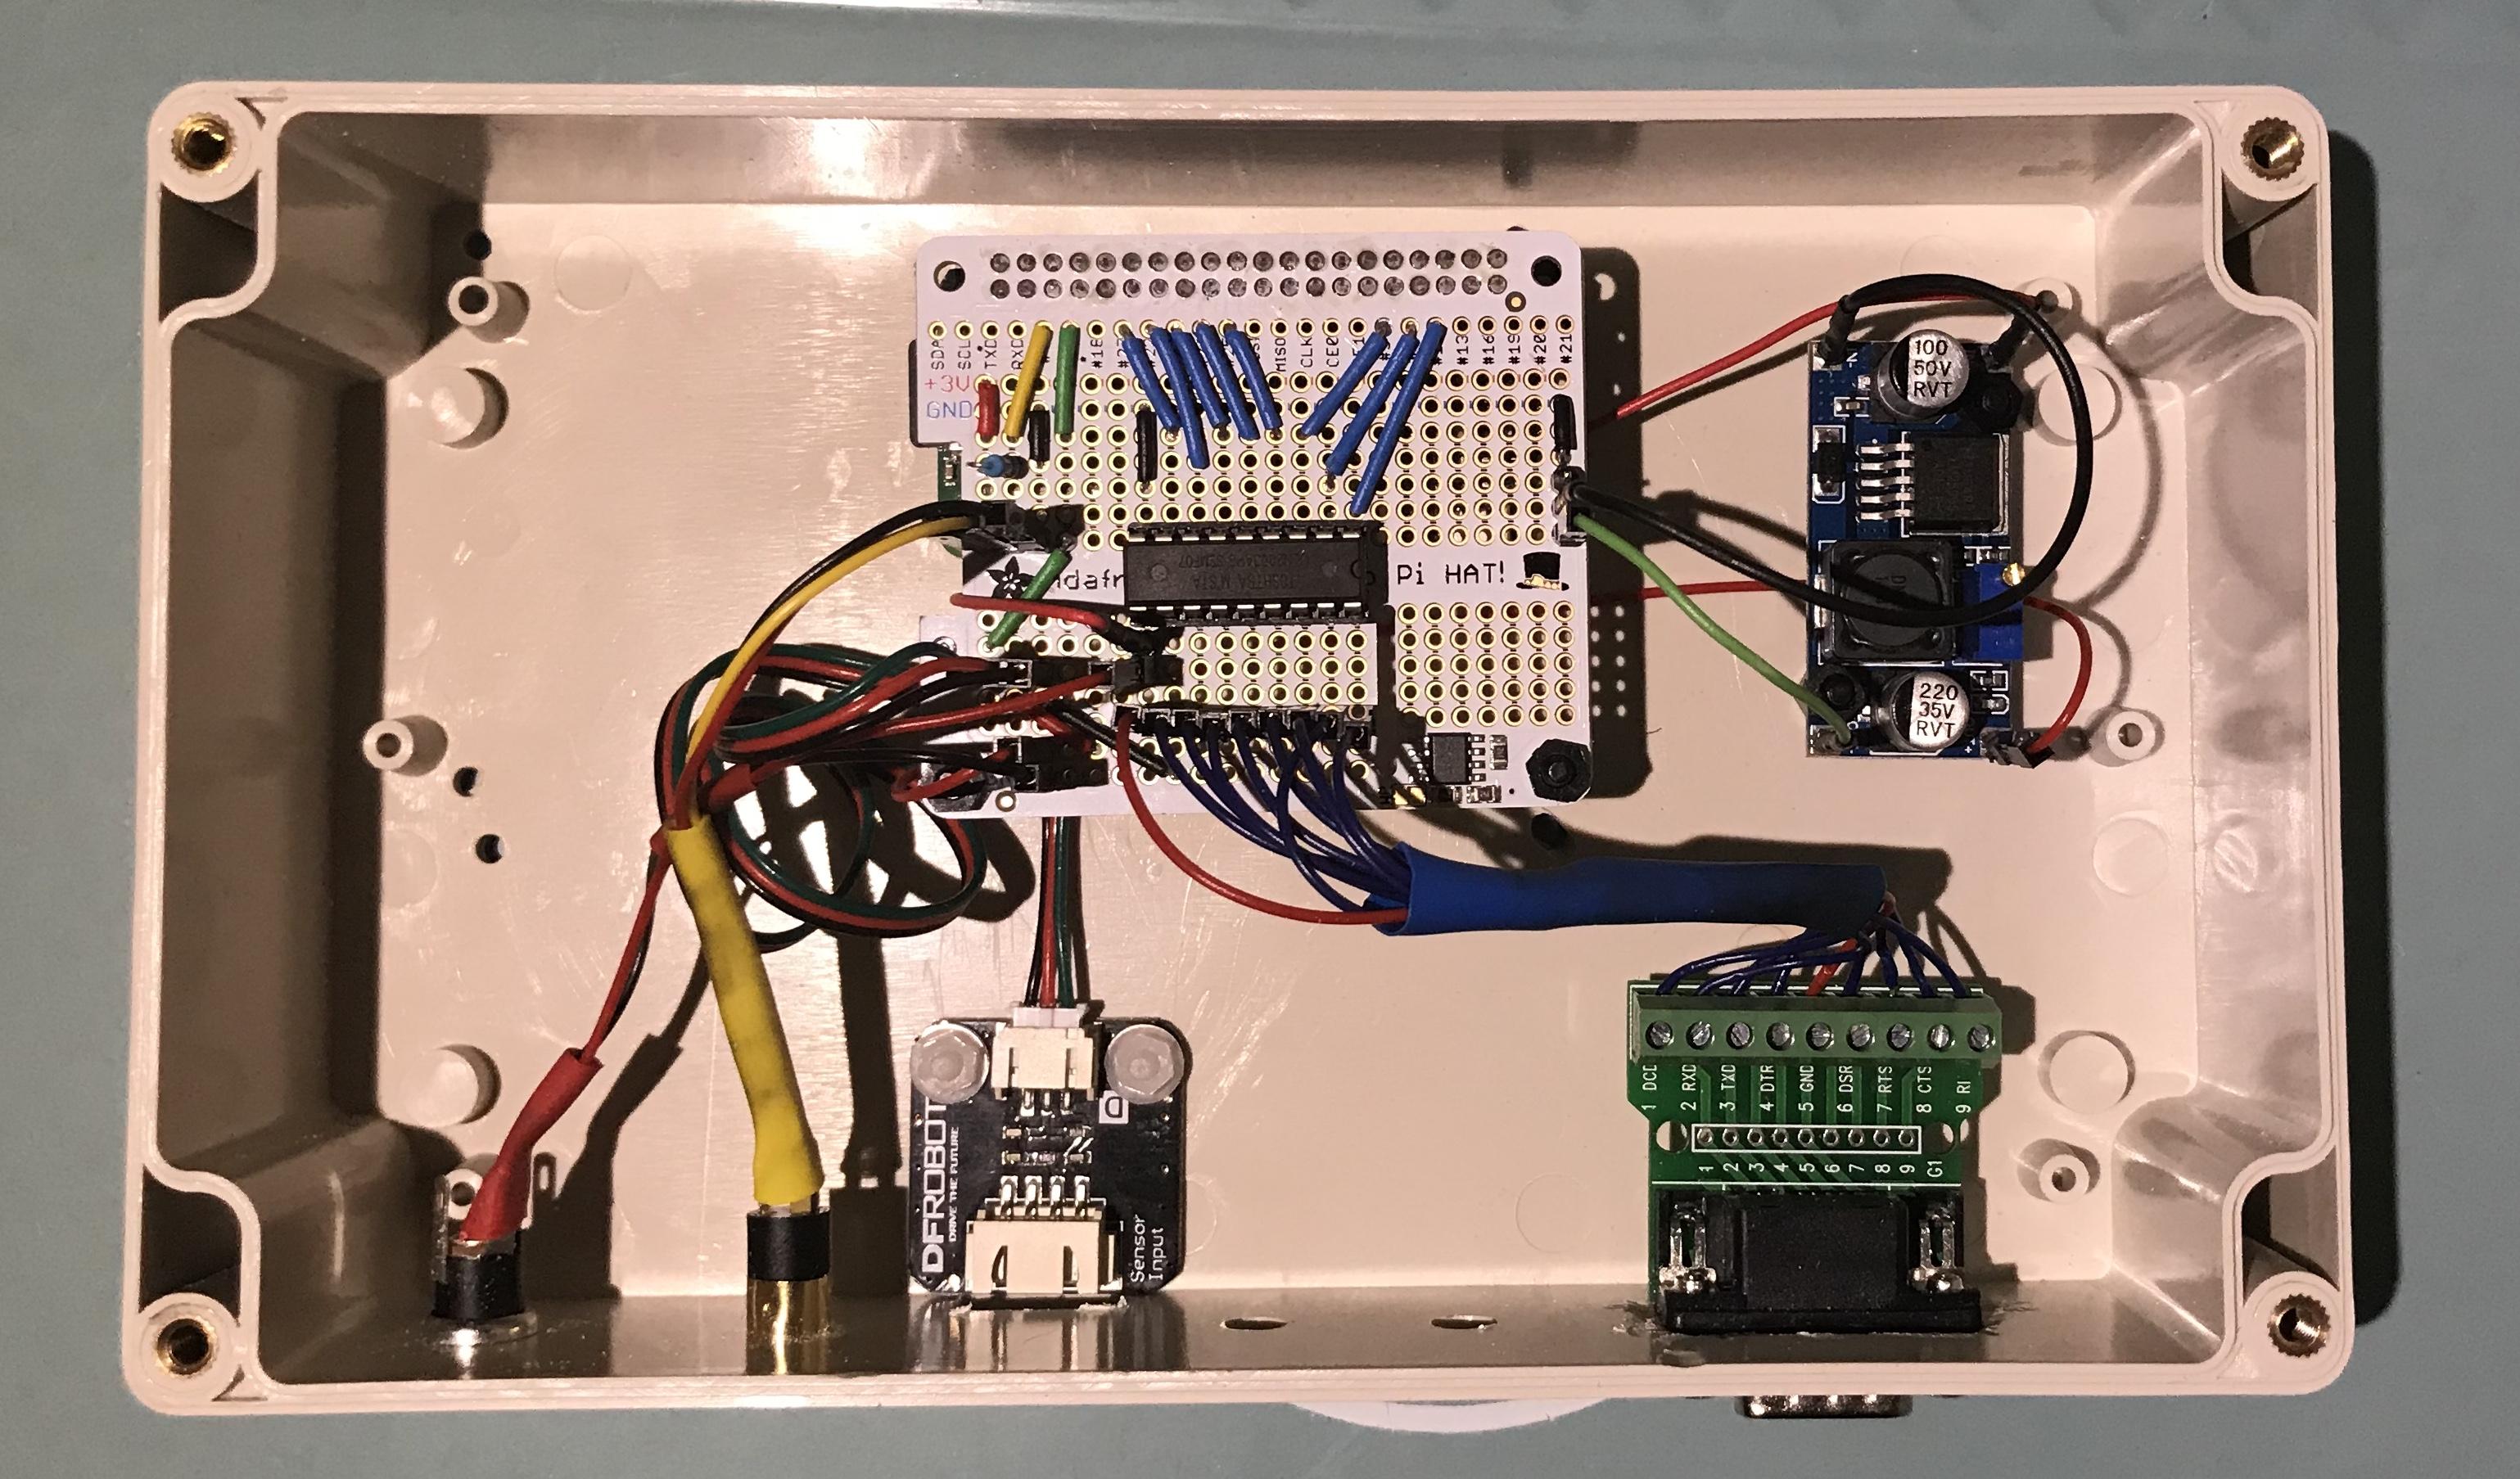 sensors_CCDBD9FA-E28C-497E-AF6D-AAF850C8B7C4.jpeg